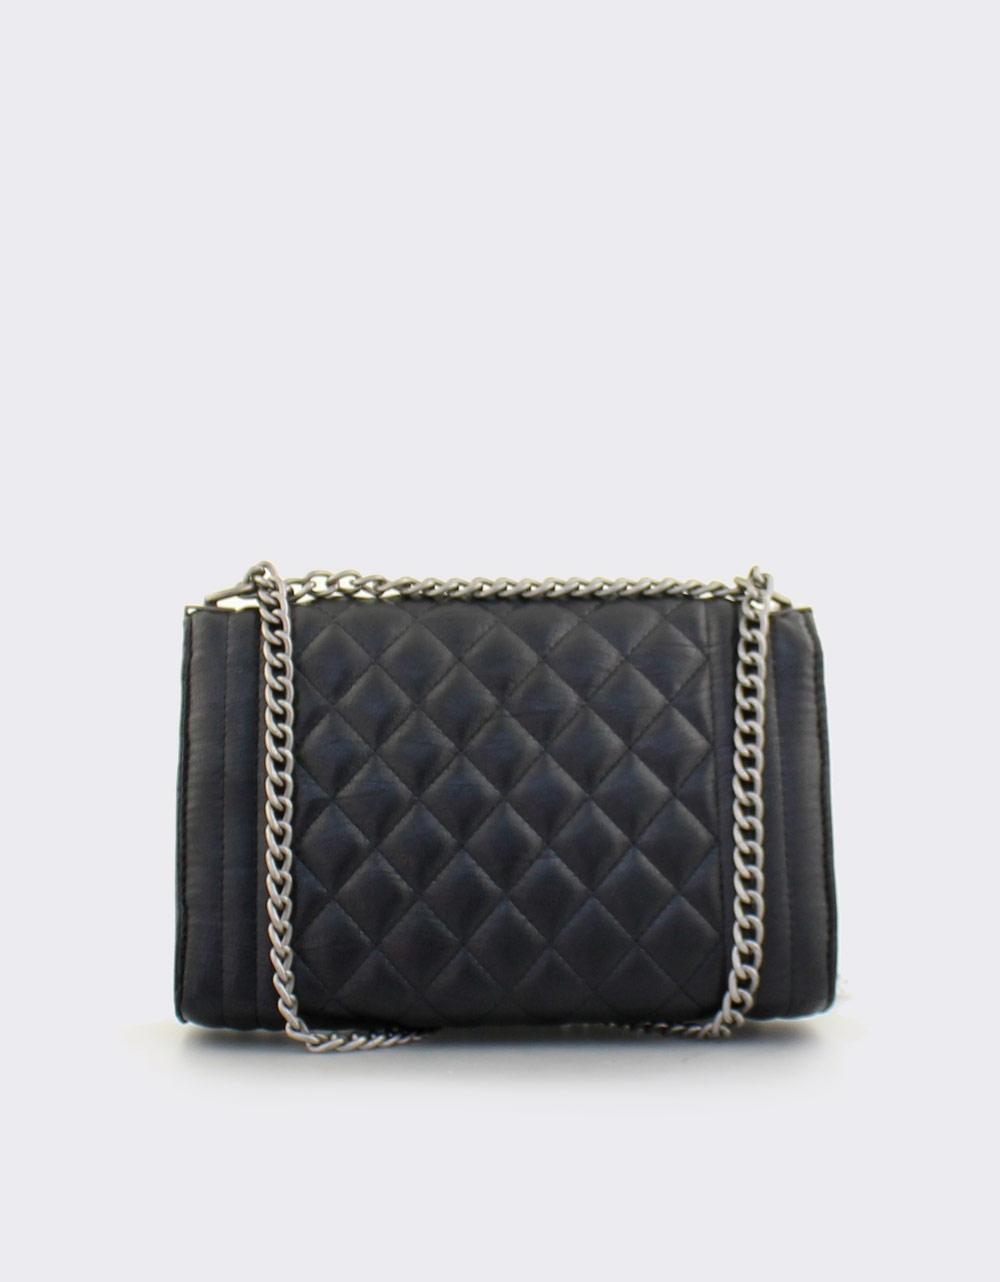 85167f2302 Εικόνα από Γυναικείες τσάντες ώμου καπιτονέ με αλυσίδα Μαύρο